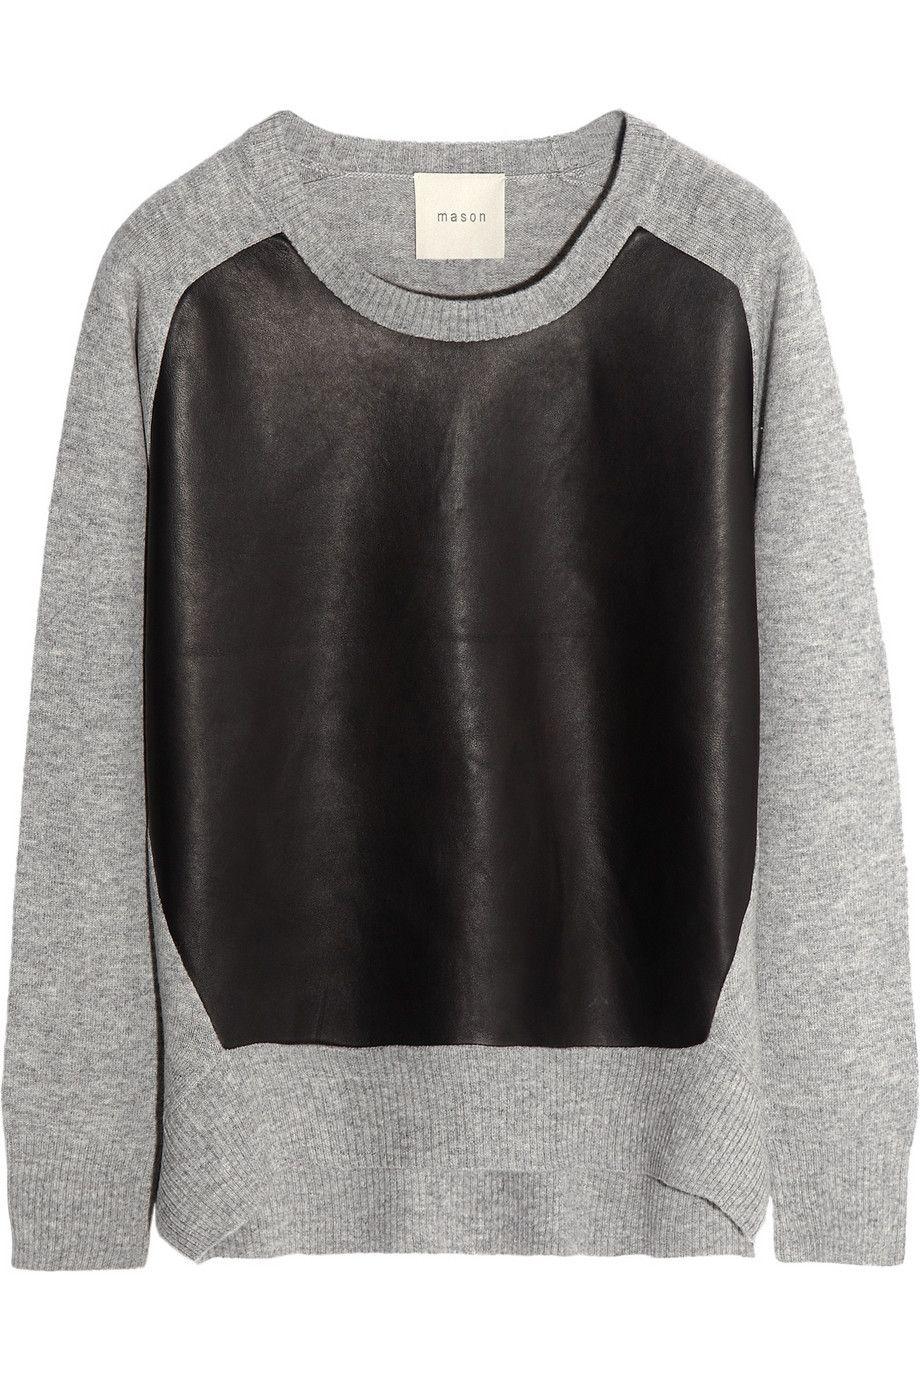 Mason by Michelle MasonLeather-paneled wool and cashmere-blend ...